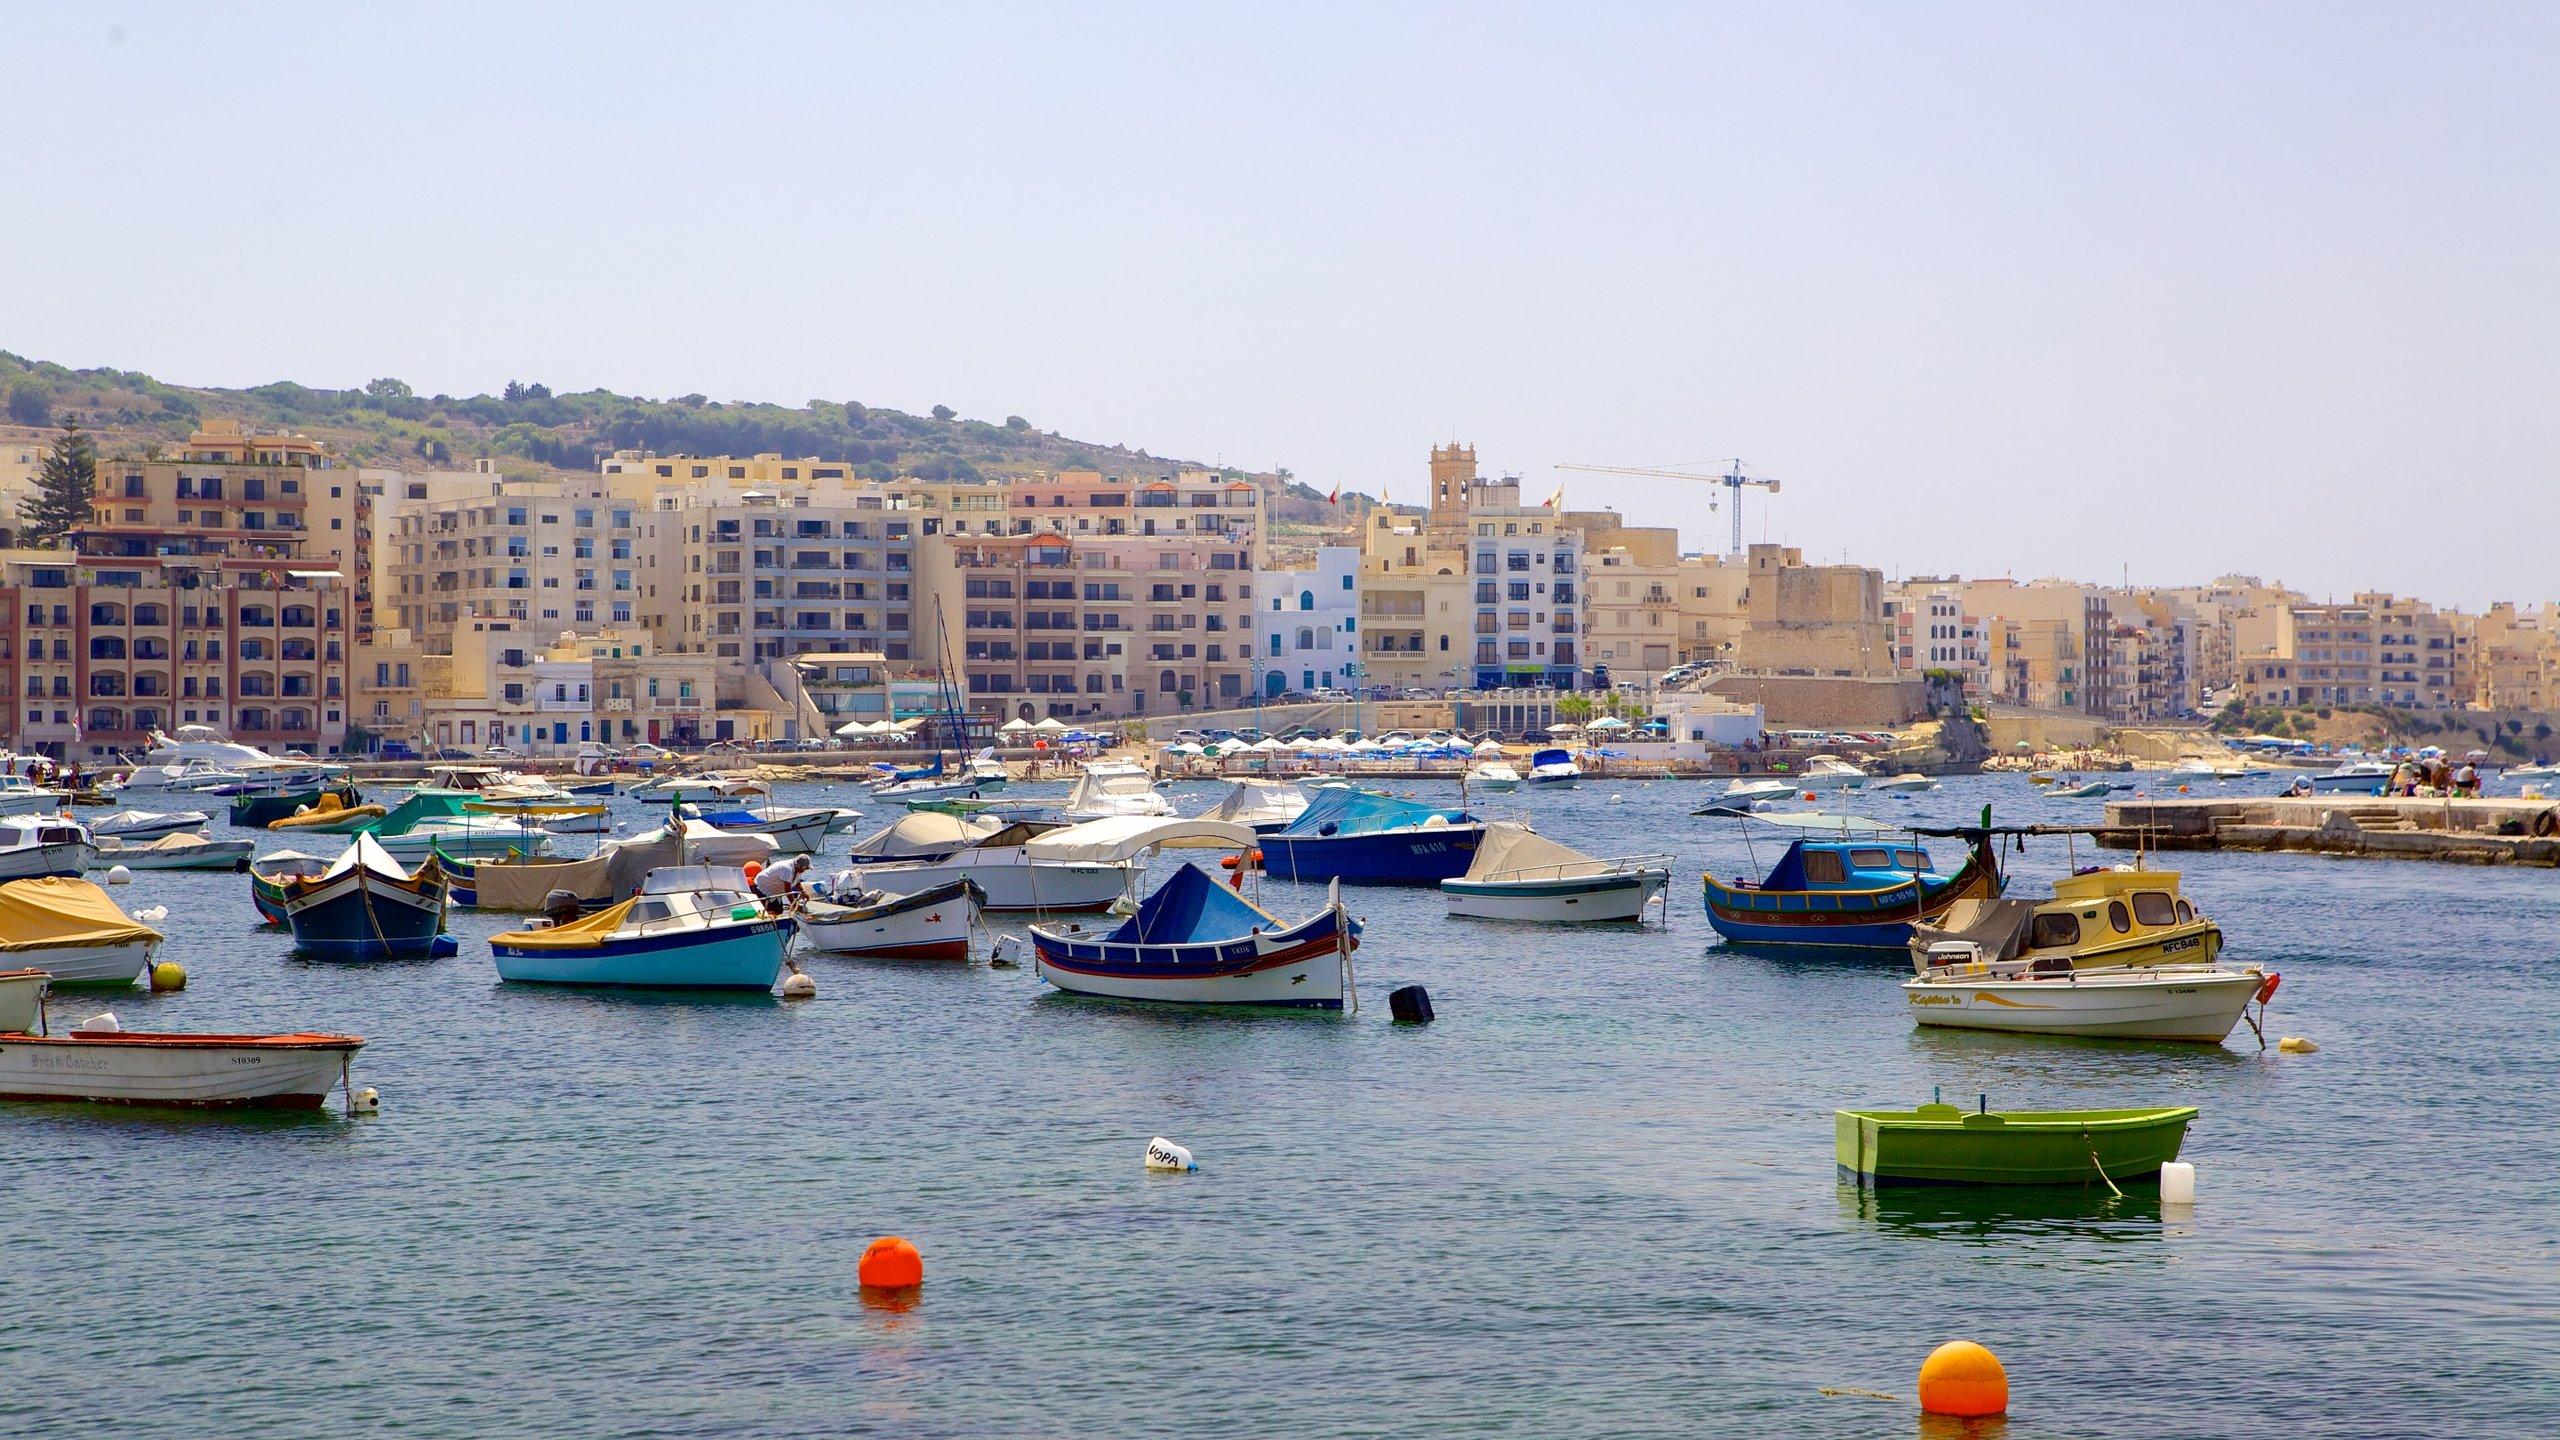 St. Paul's Bay, Northern Region, Malta